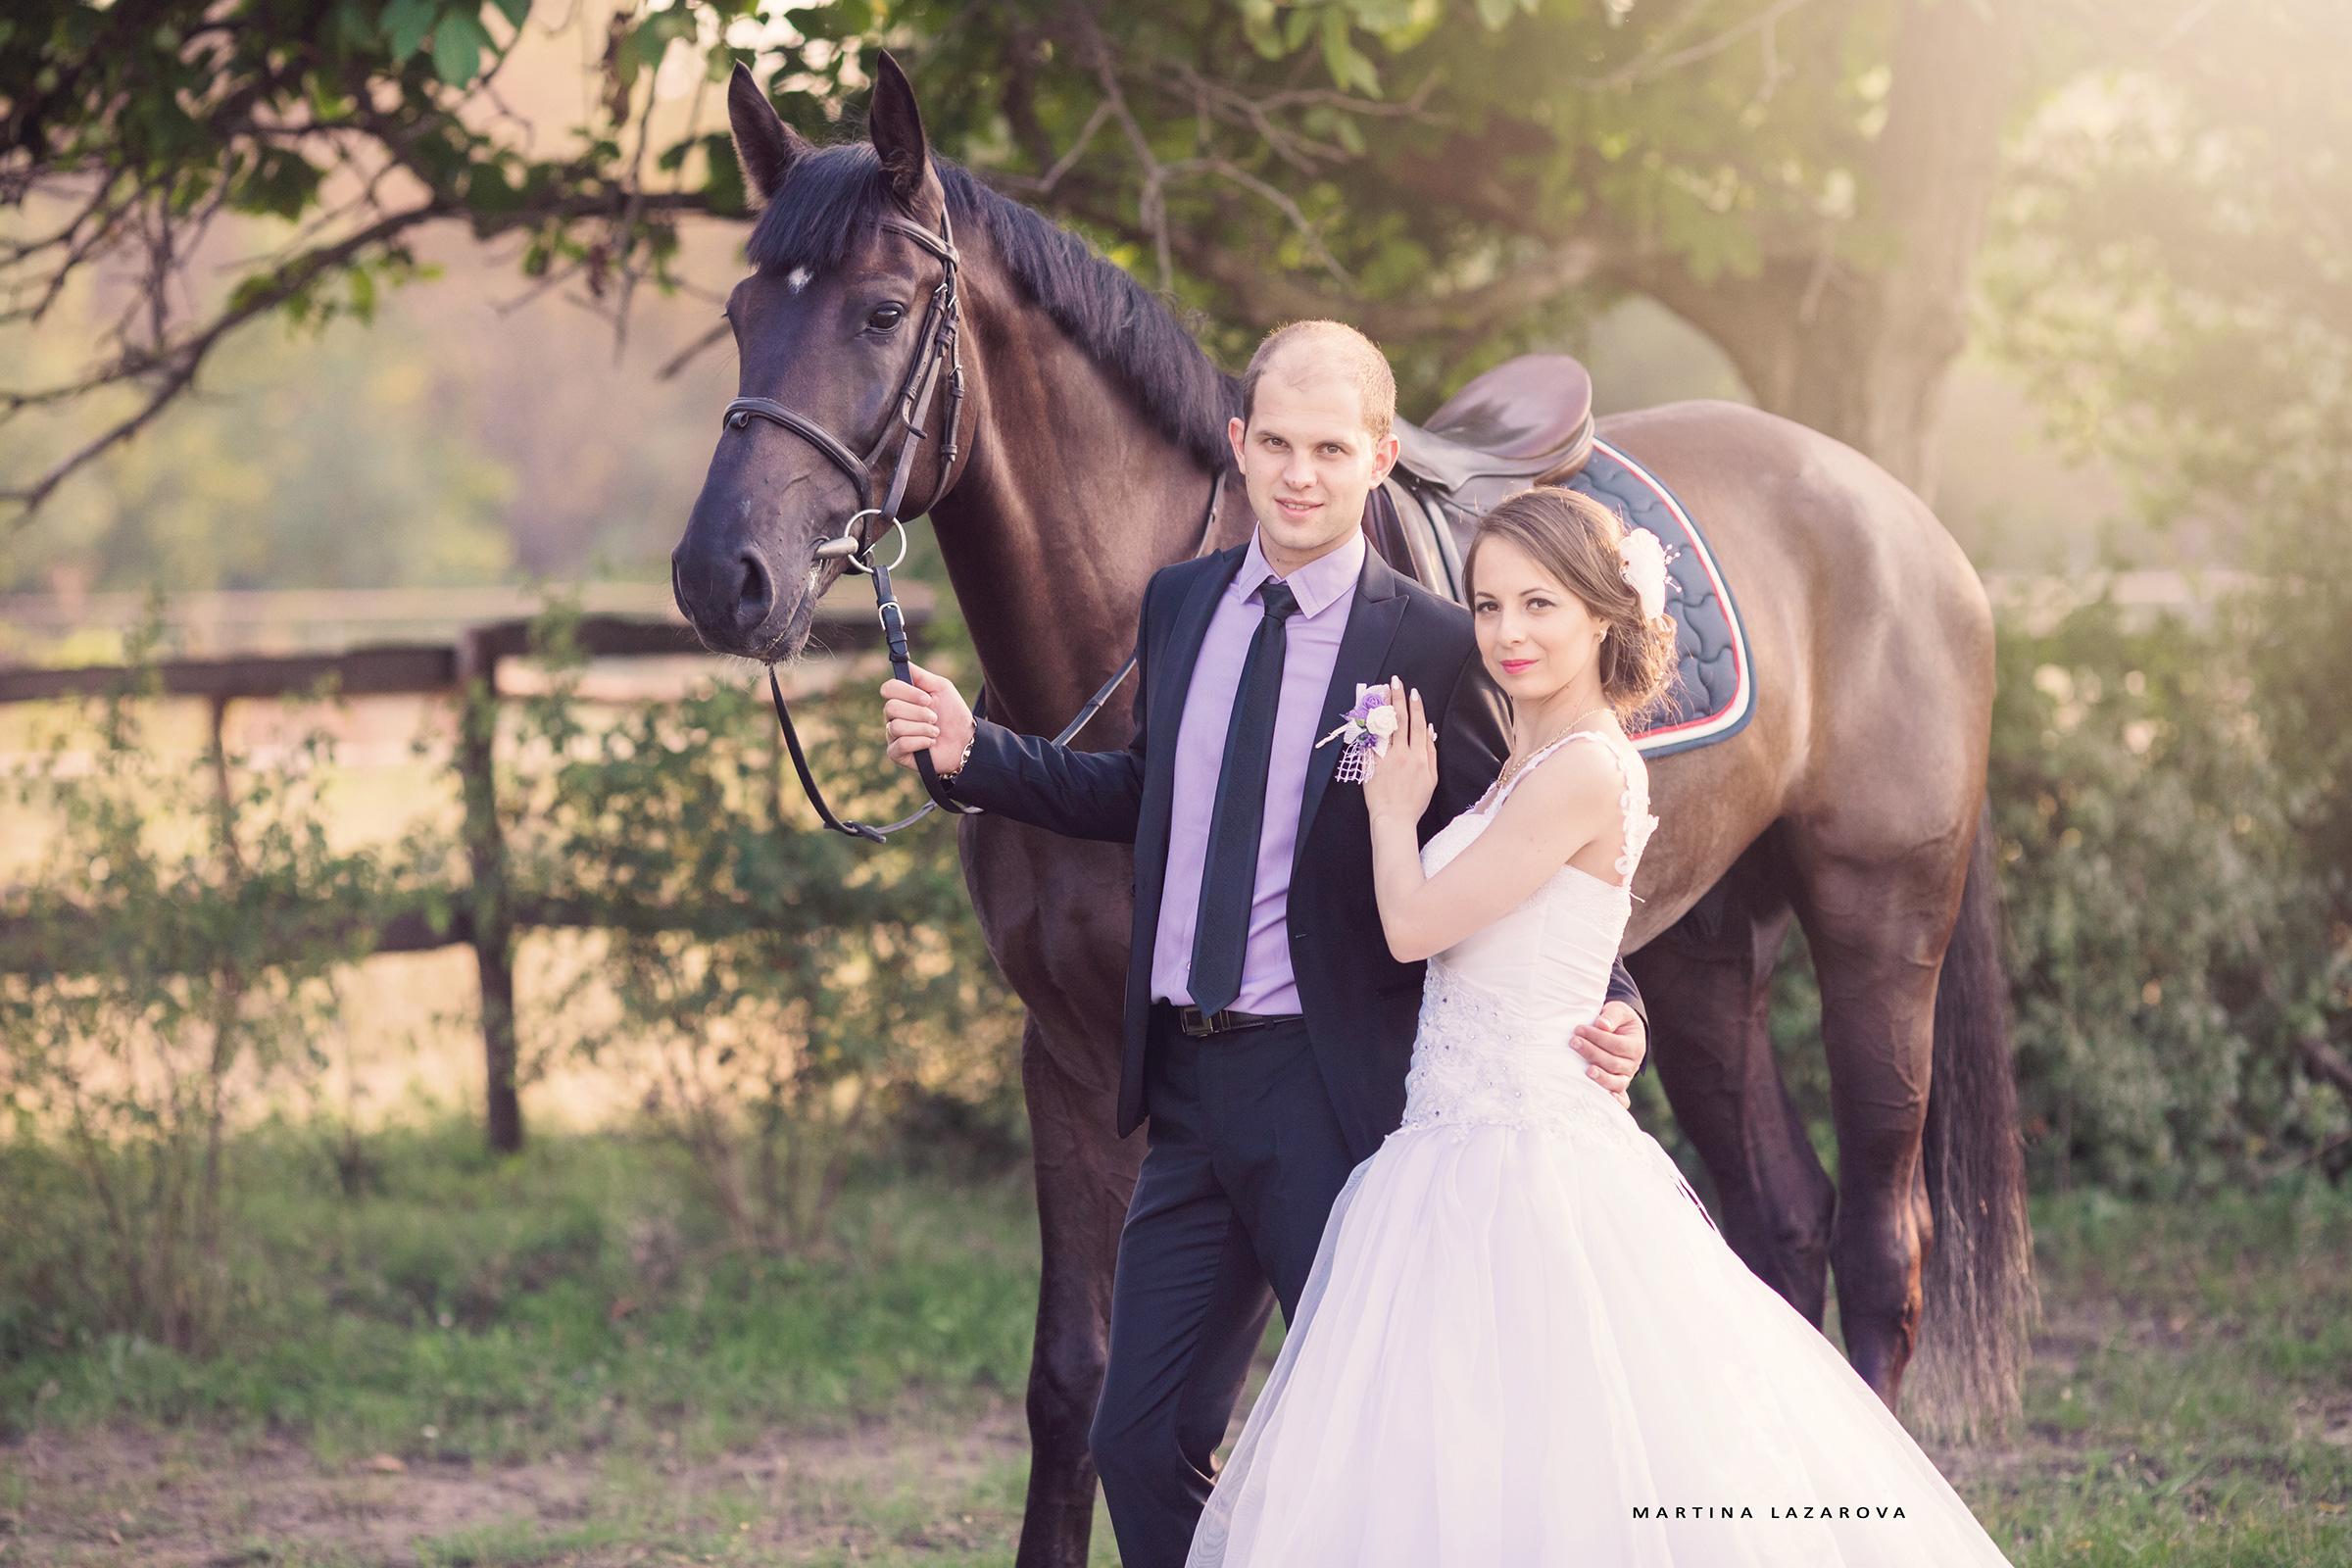 Wedding-PhotoShoot-A&S-8